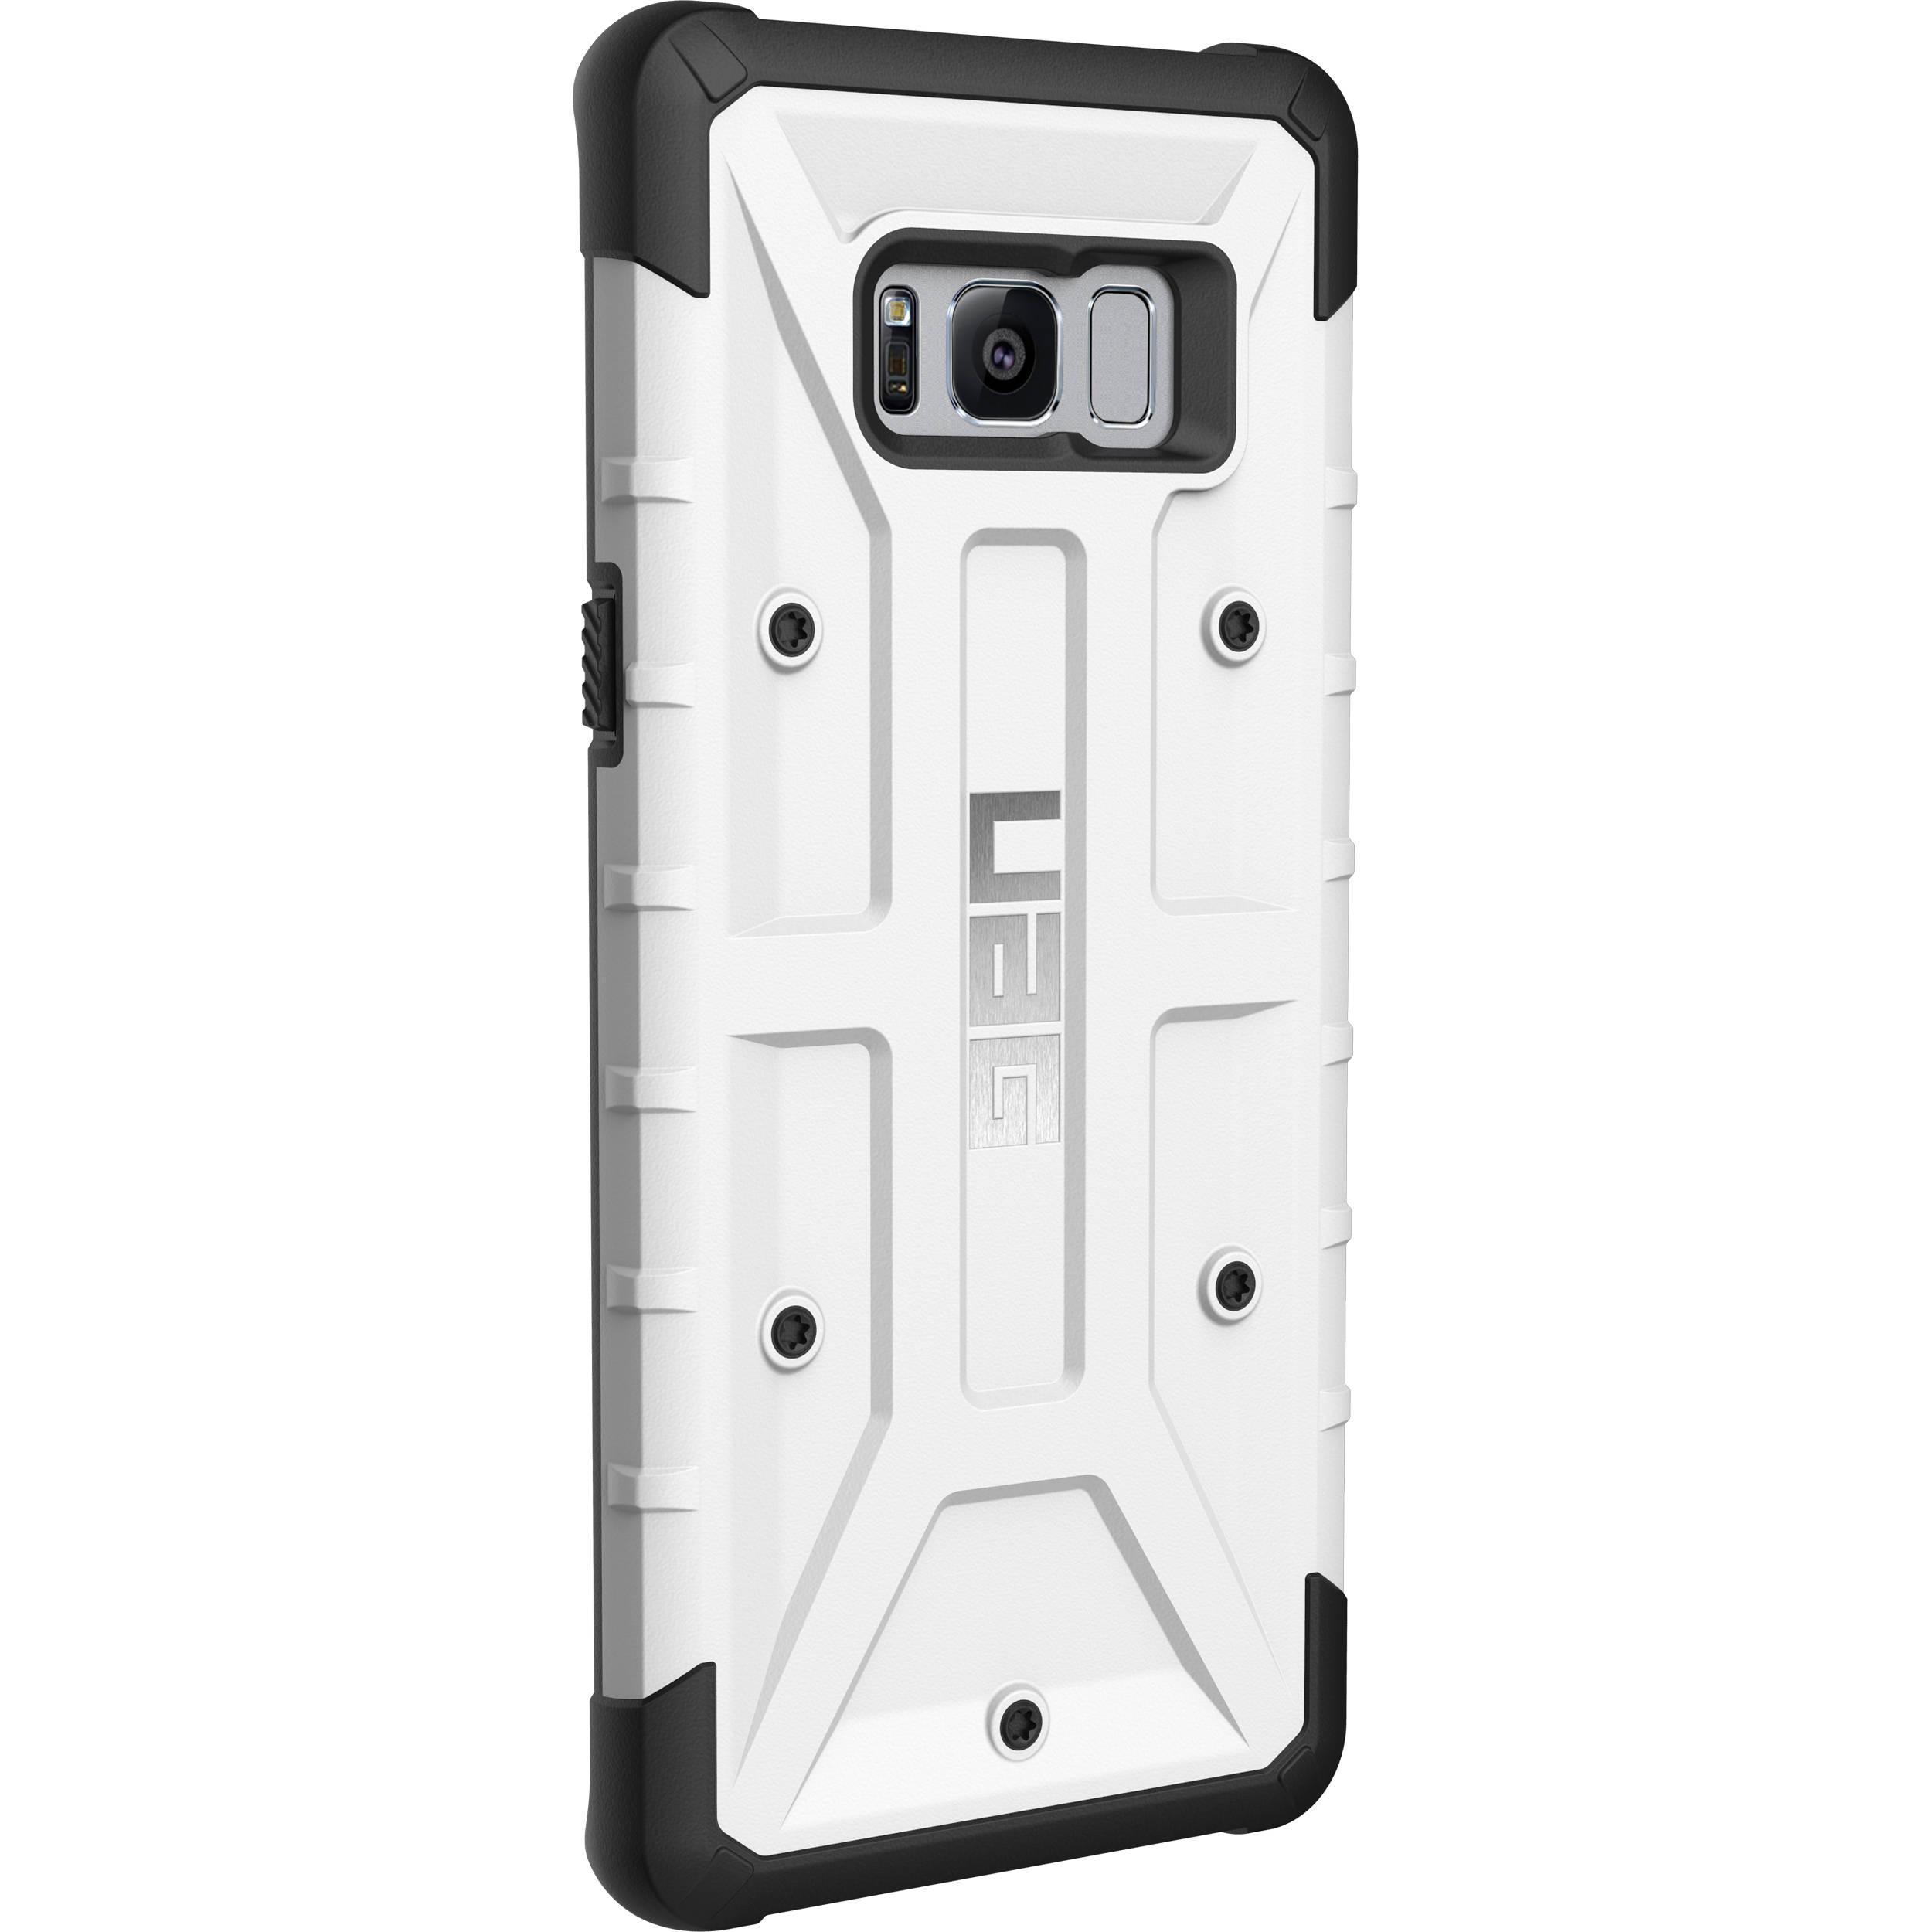 Urban Armor Gear Pathfinder Case for Galaxy S8+ GLXS8PLS-A-WH